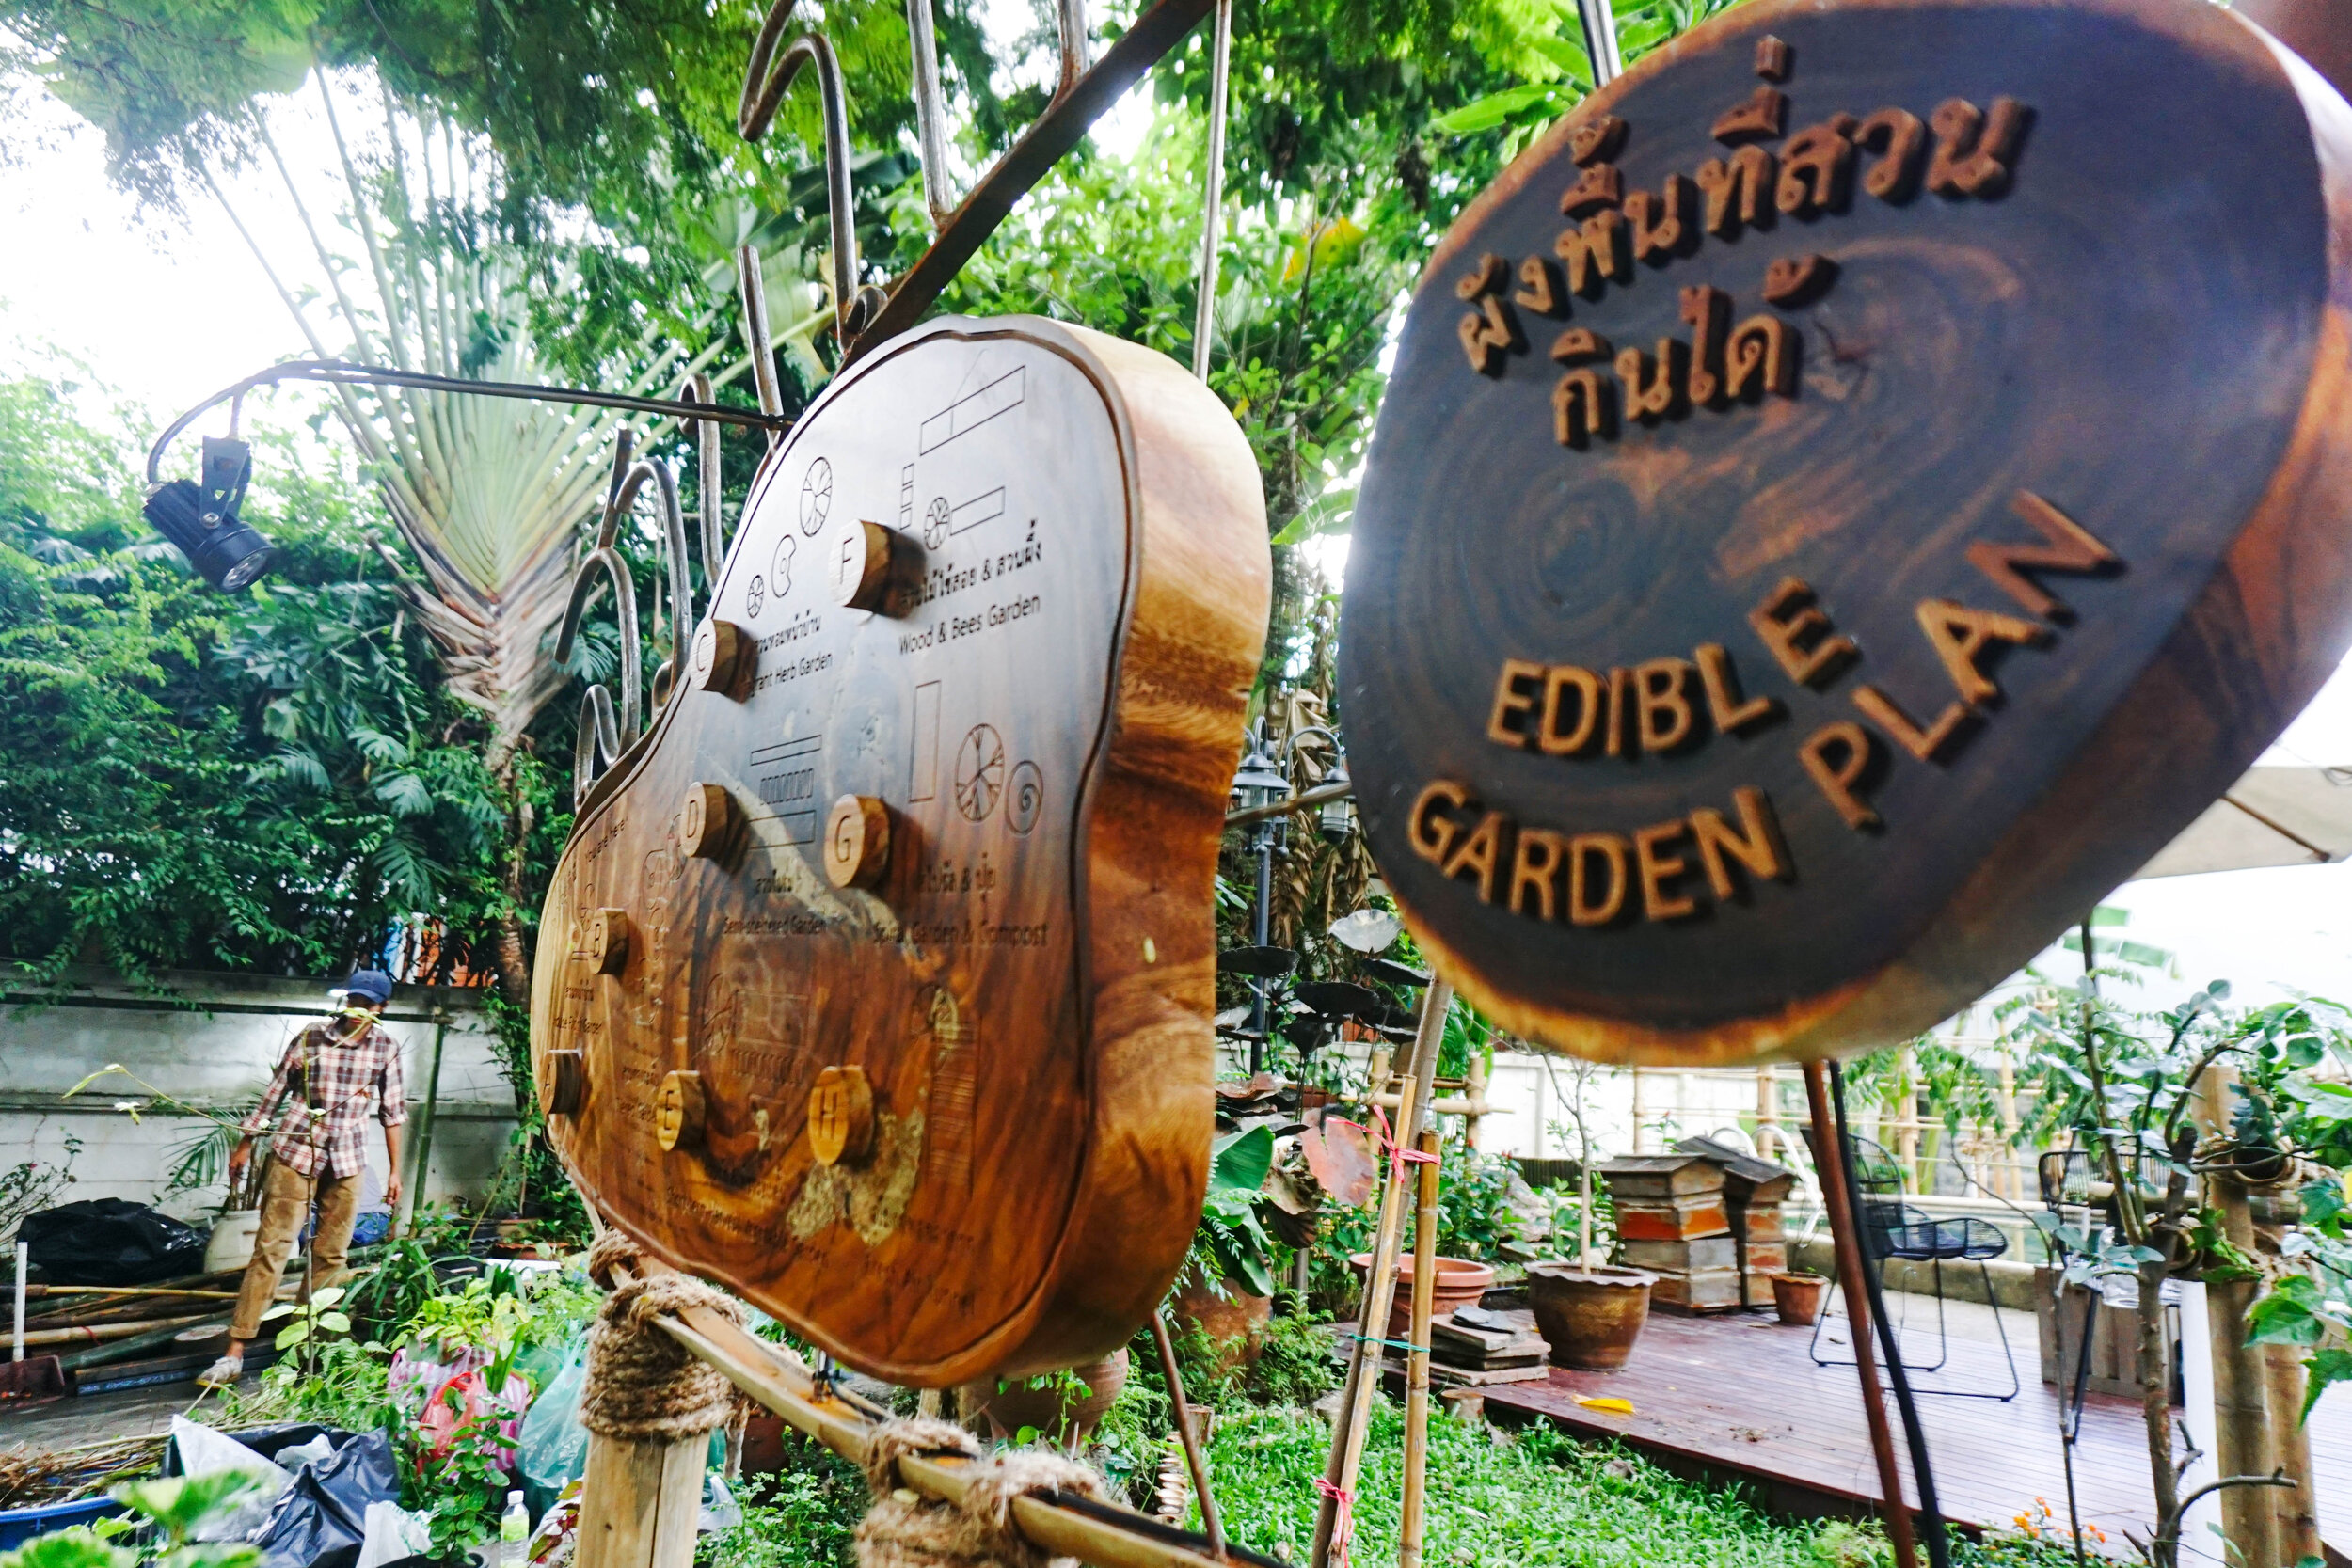 Openspace: Bo.lan edible garden plan